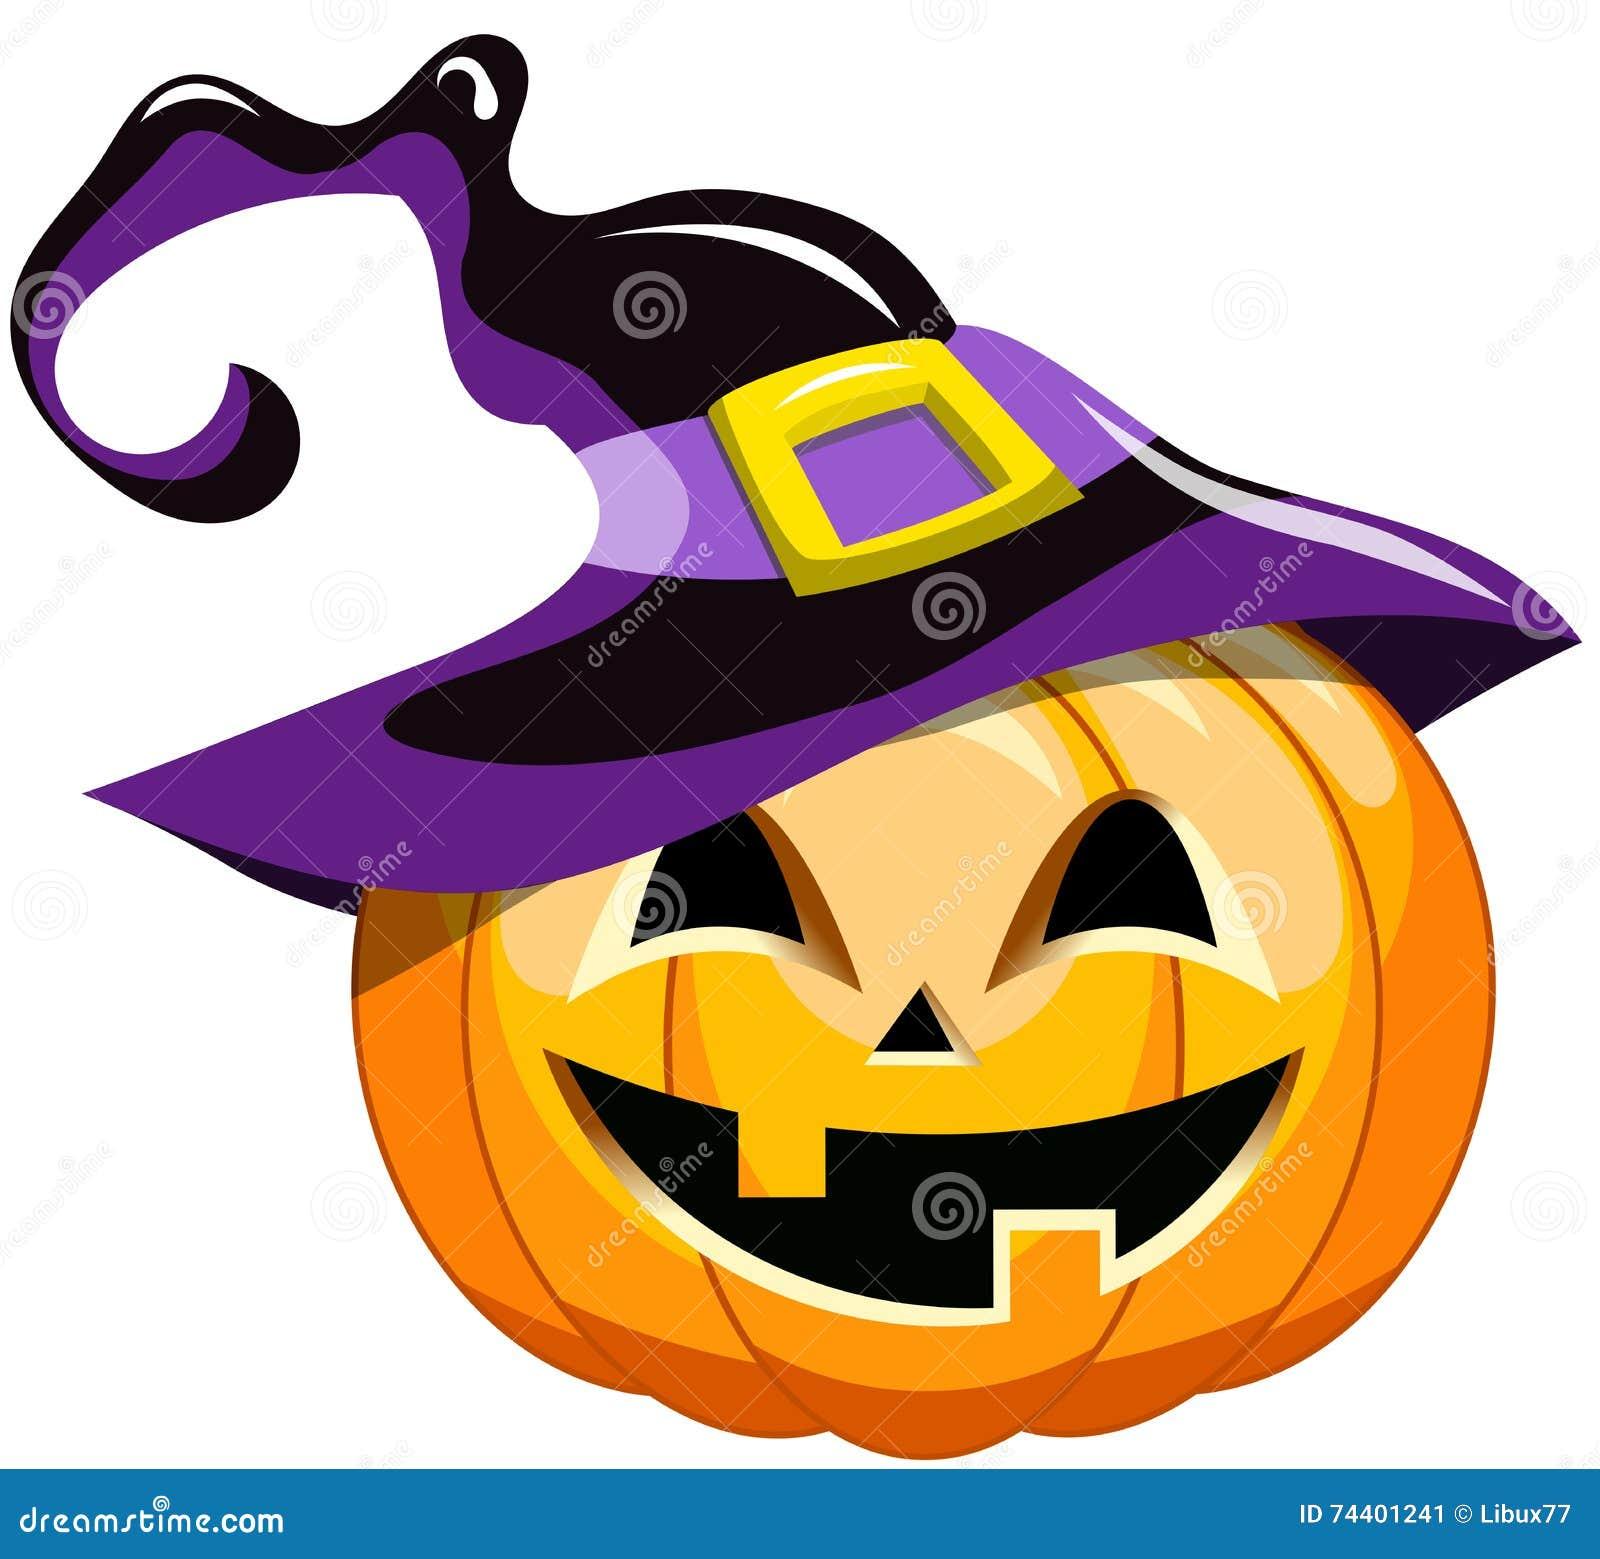 cartoon halloween pumpkin witch hat stock image - Halloween Witch Cartoon